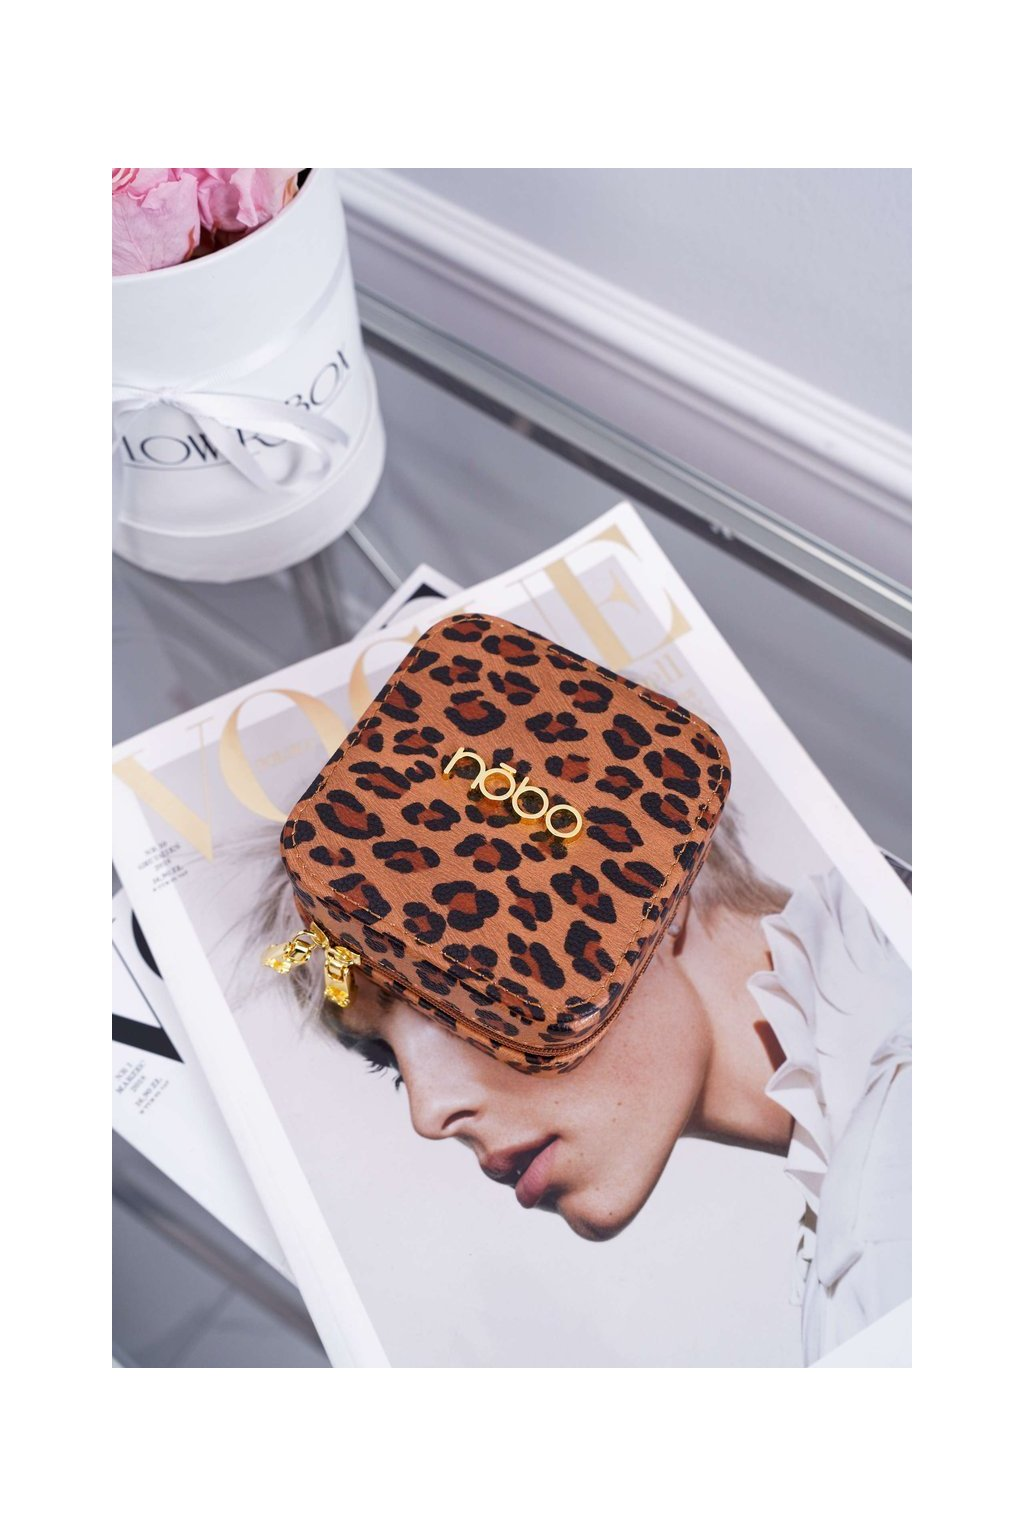 Malá Dámska šperkovnica NOBO Leopard NBOX-I08-C017